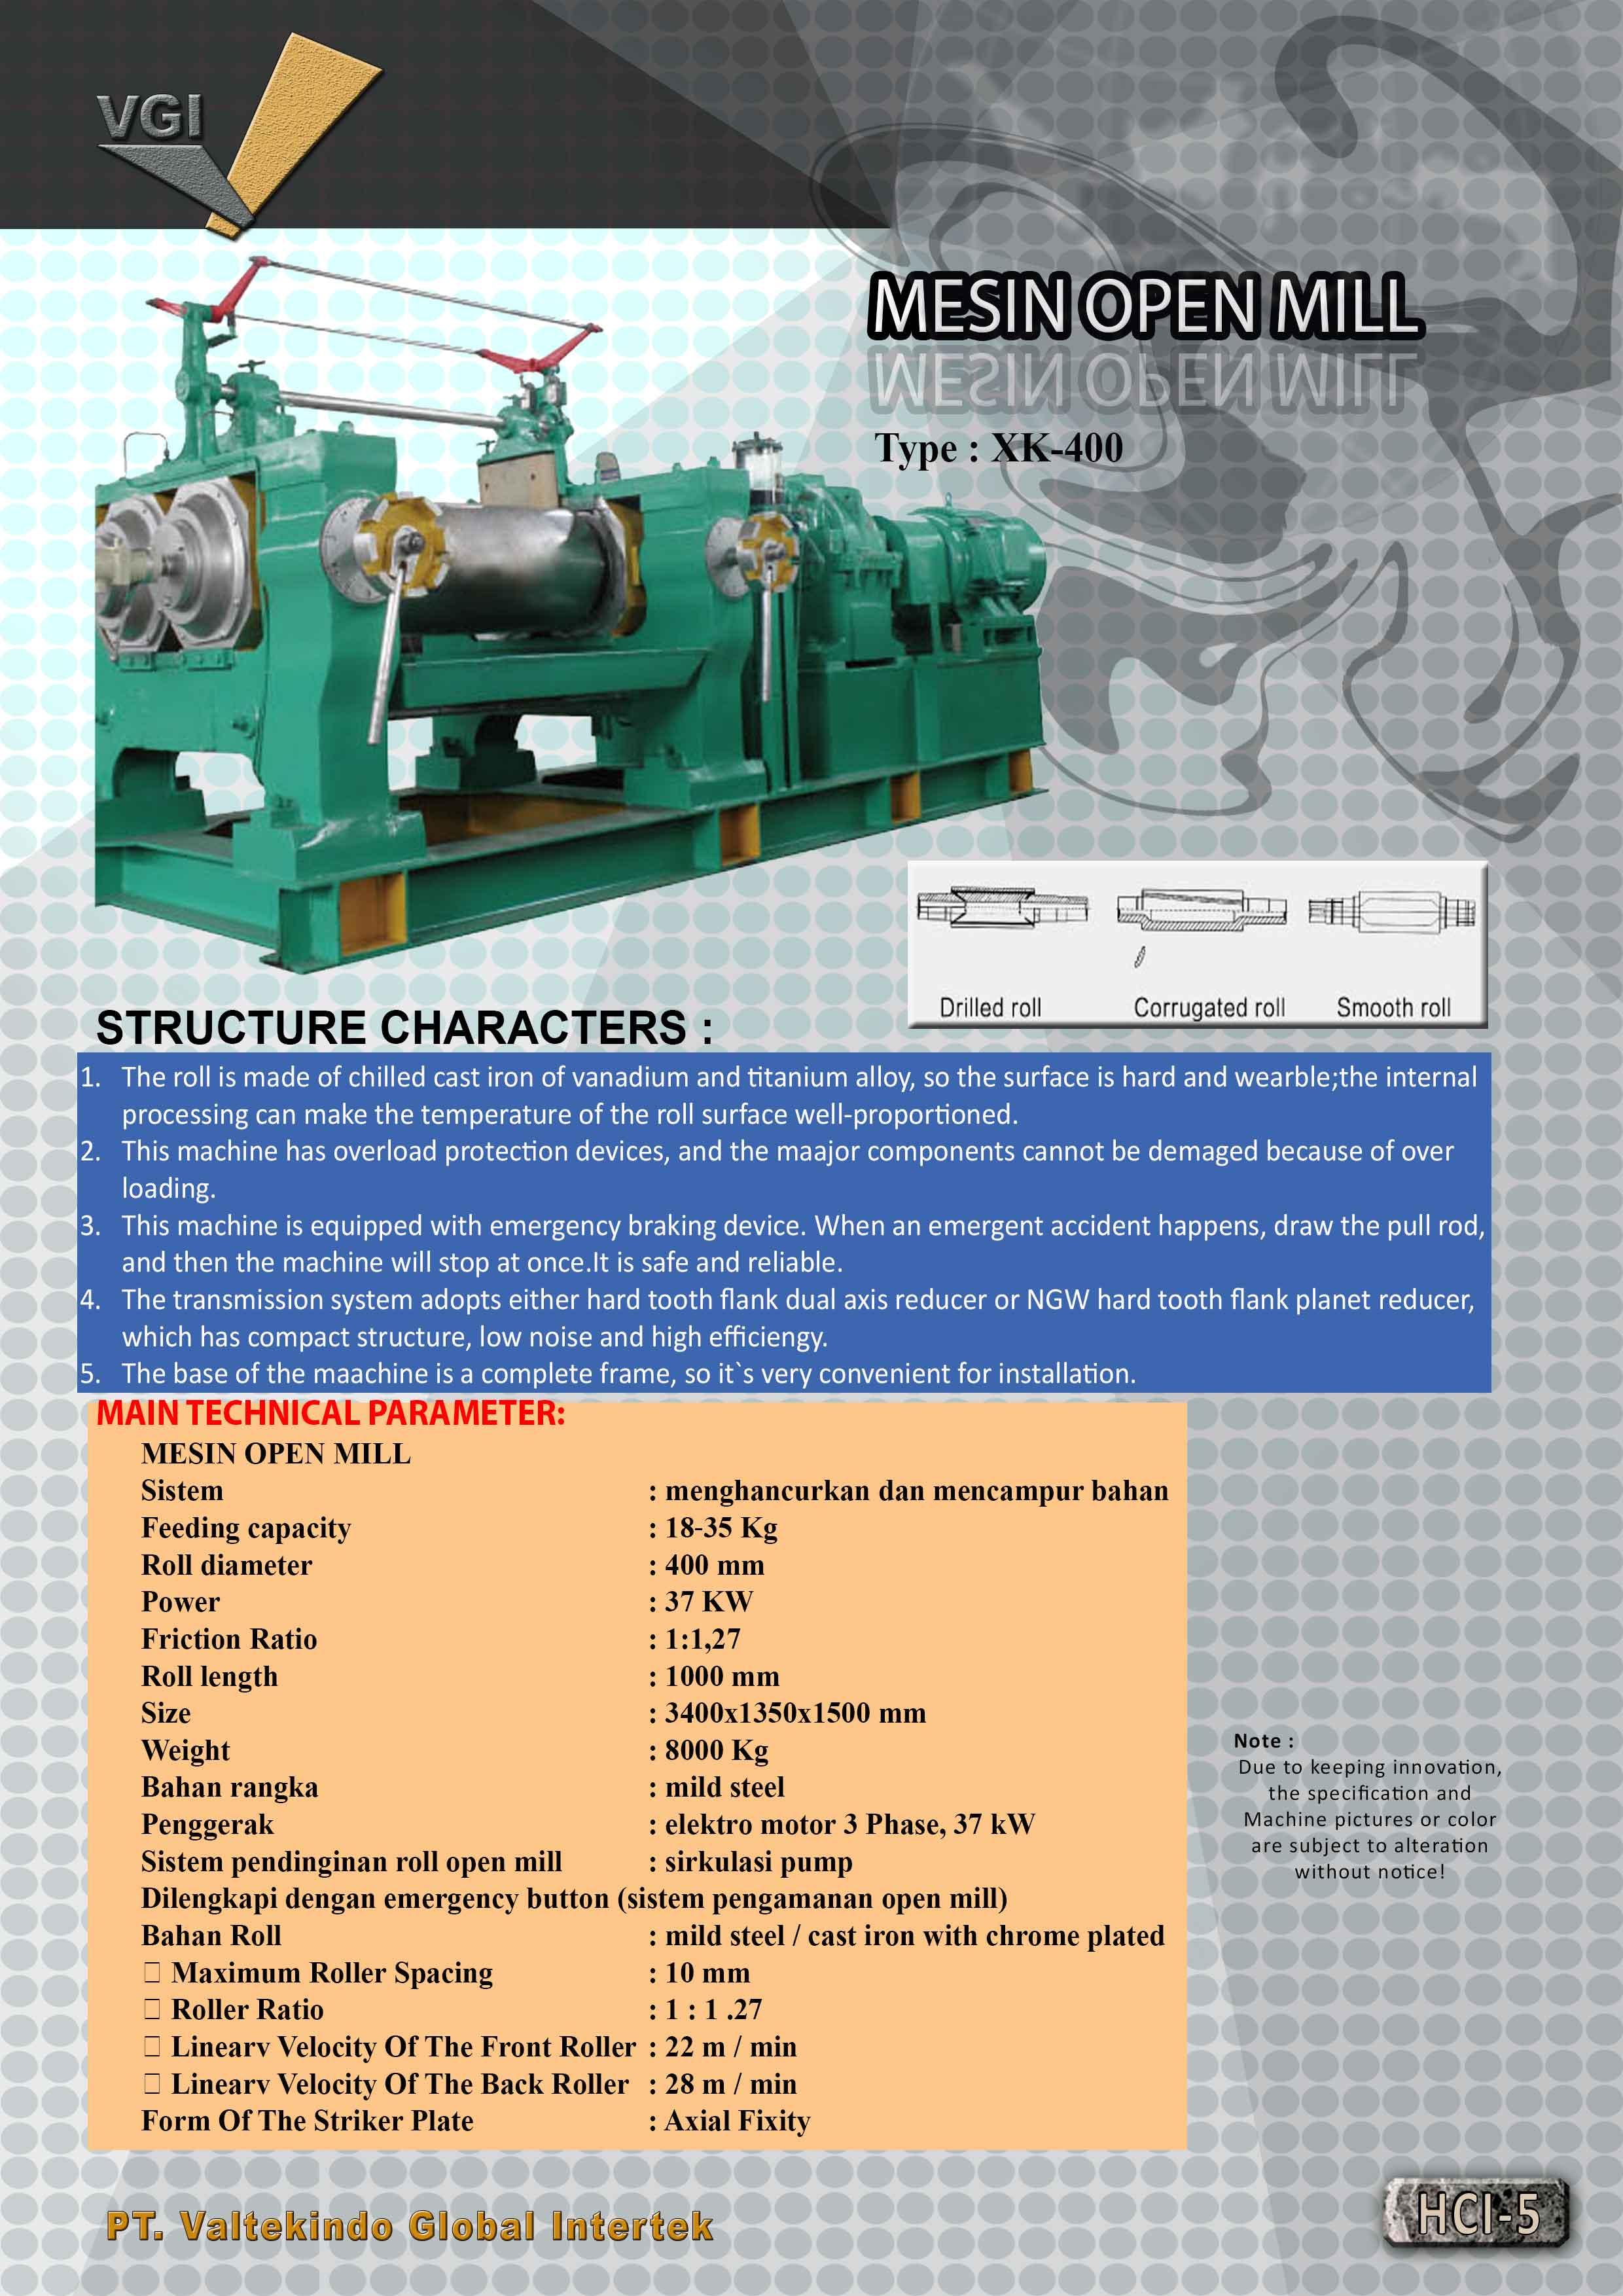 jual mesin, harga mesin, jual mesin bandung, distributor mesin, jual mesin karet, daur ulang karet, daur ulang plastik, mesin pertanian Open Mill Type  Open Mill Type